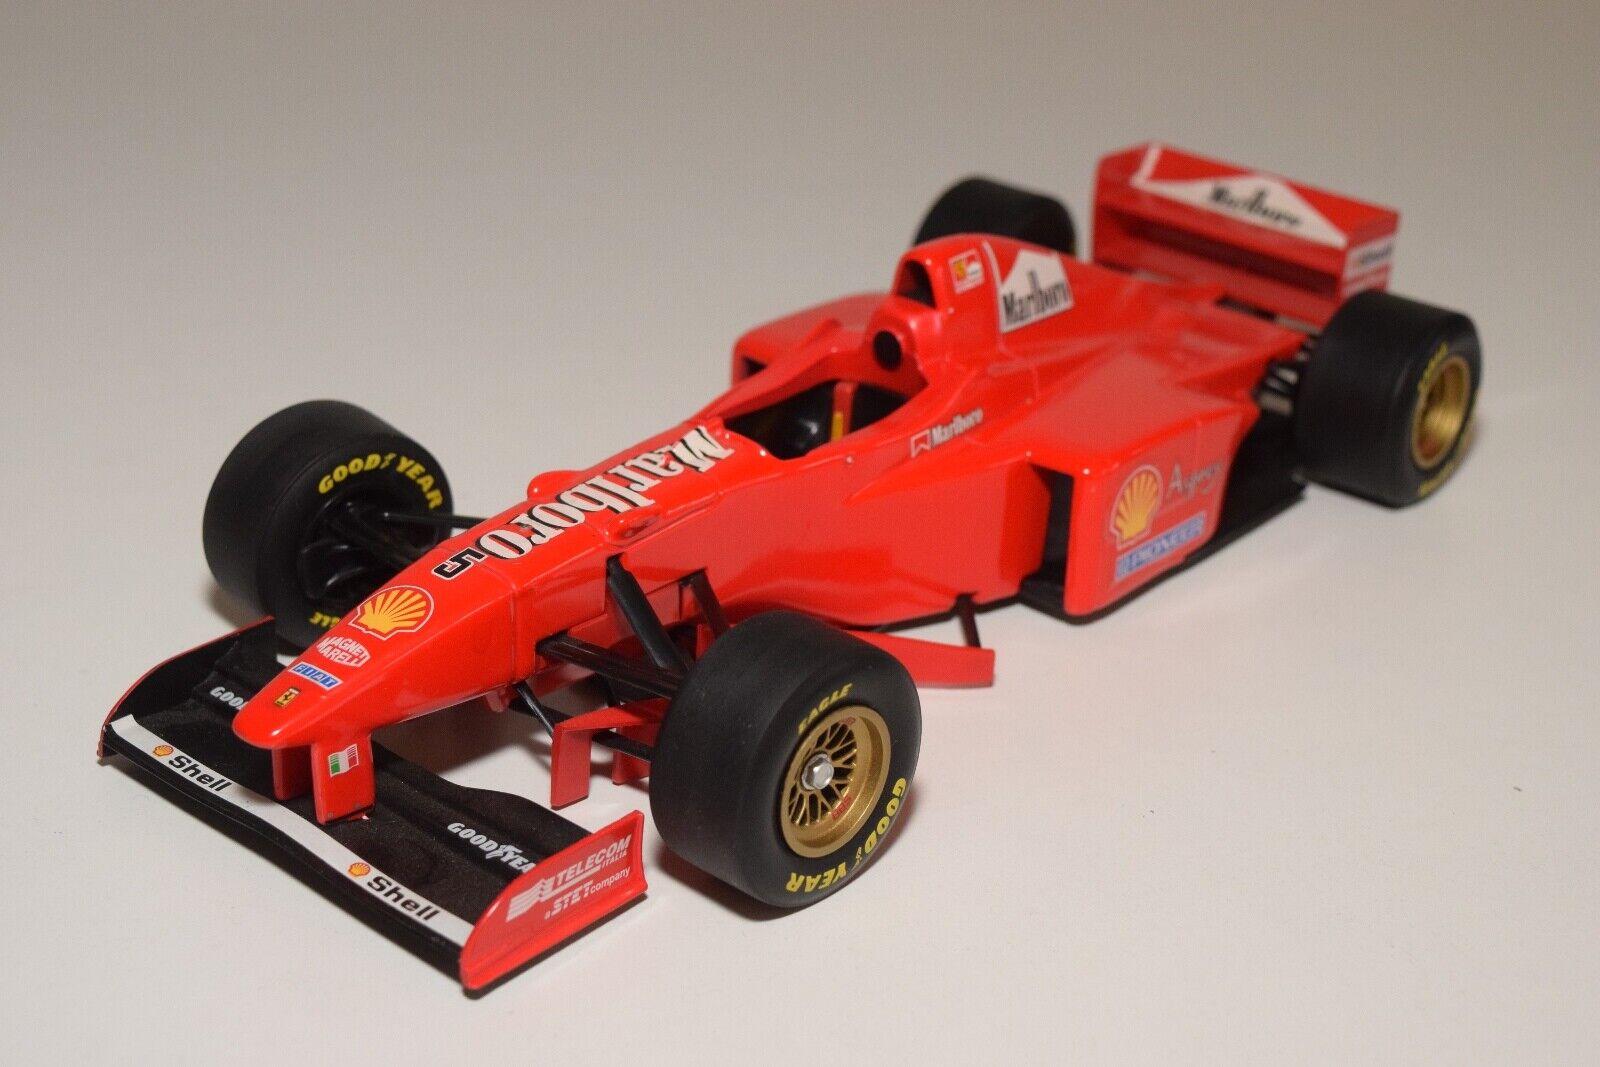 V 1 18 MINICHAMPS FERRARI F1 FORMULA 1 RACING CAR F310B F310 B 1997 SCHUMACHER